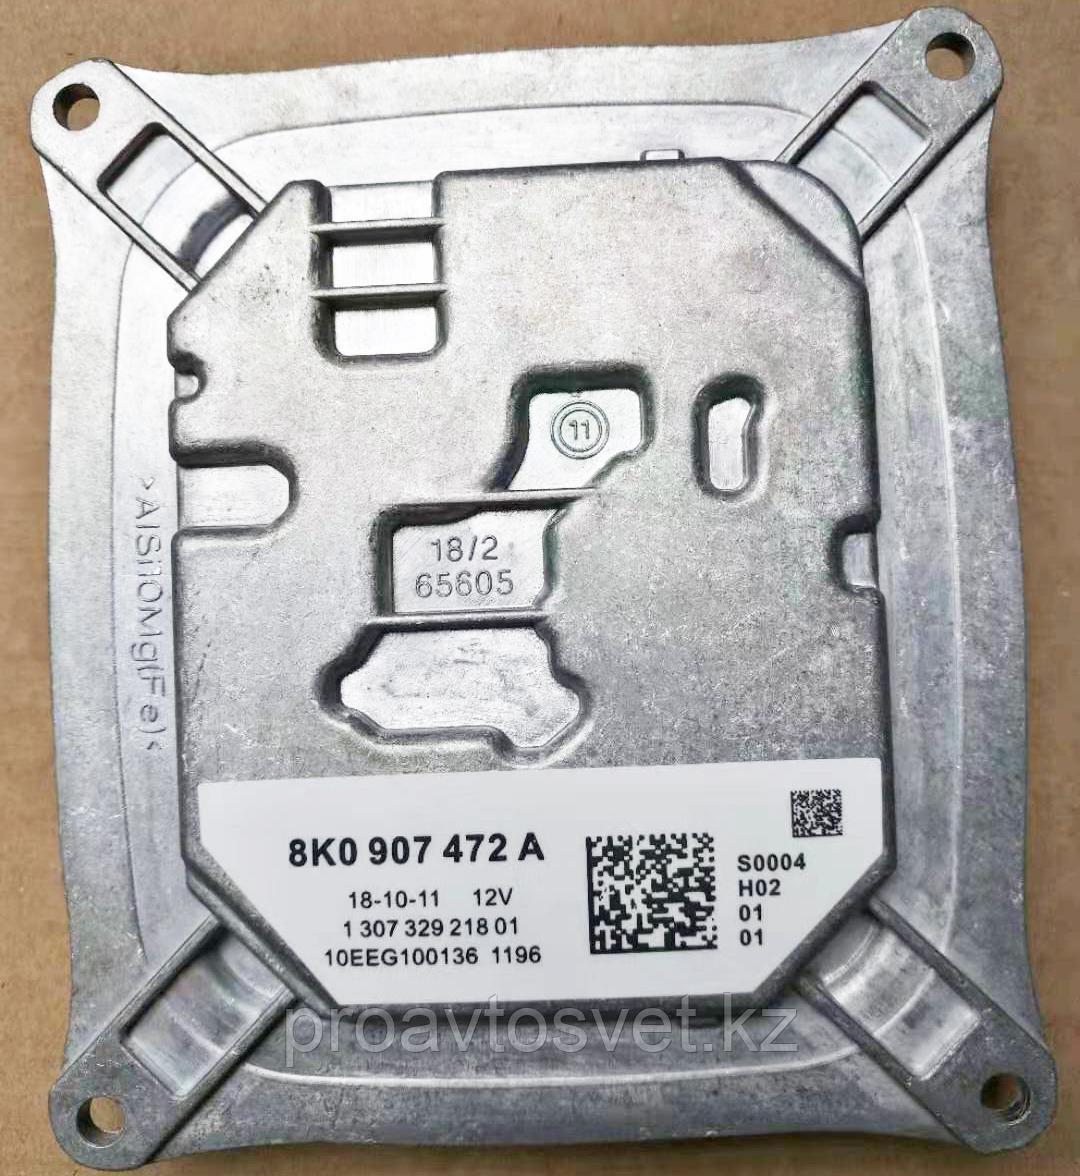 Bosch AL 8K0907472A 130732921801